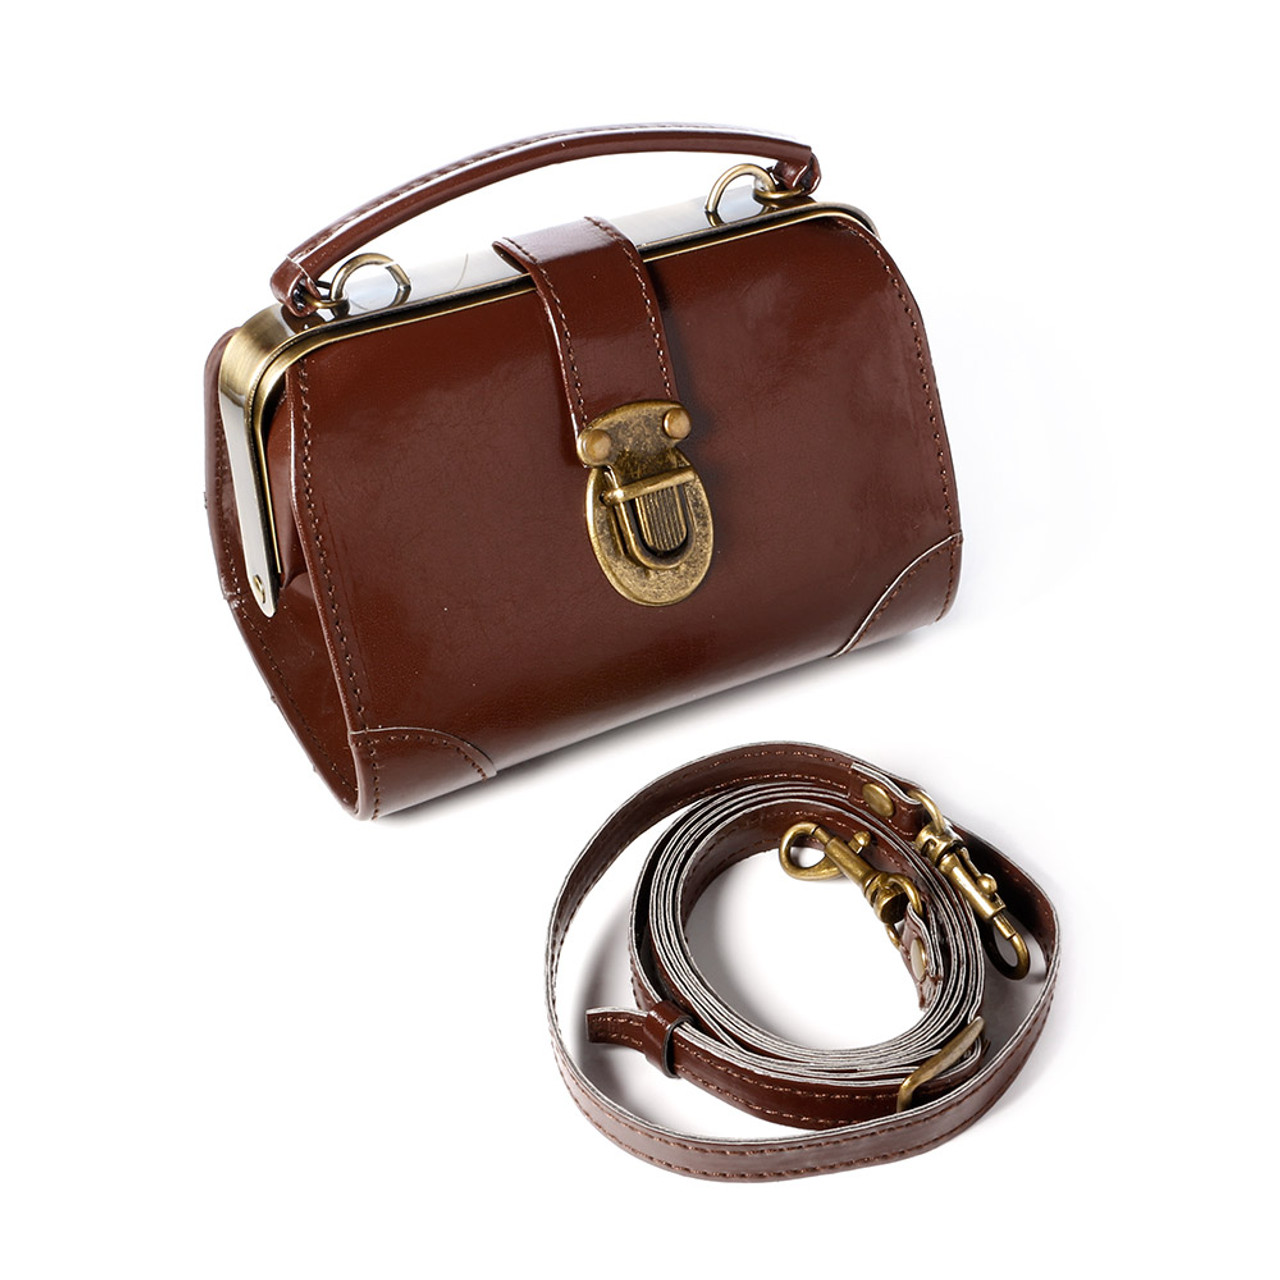 Seto Craft Motif Mini Doctor Bag Shape Pouch / Cosmetic Bag - Brown Color ( Feature 01 )